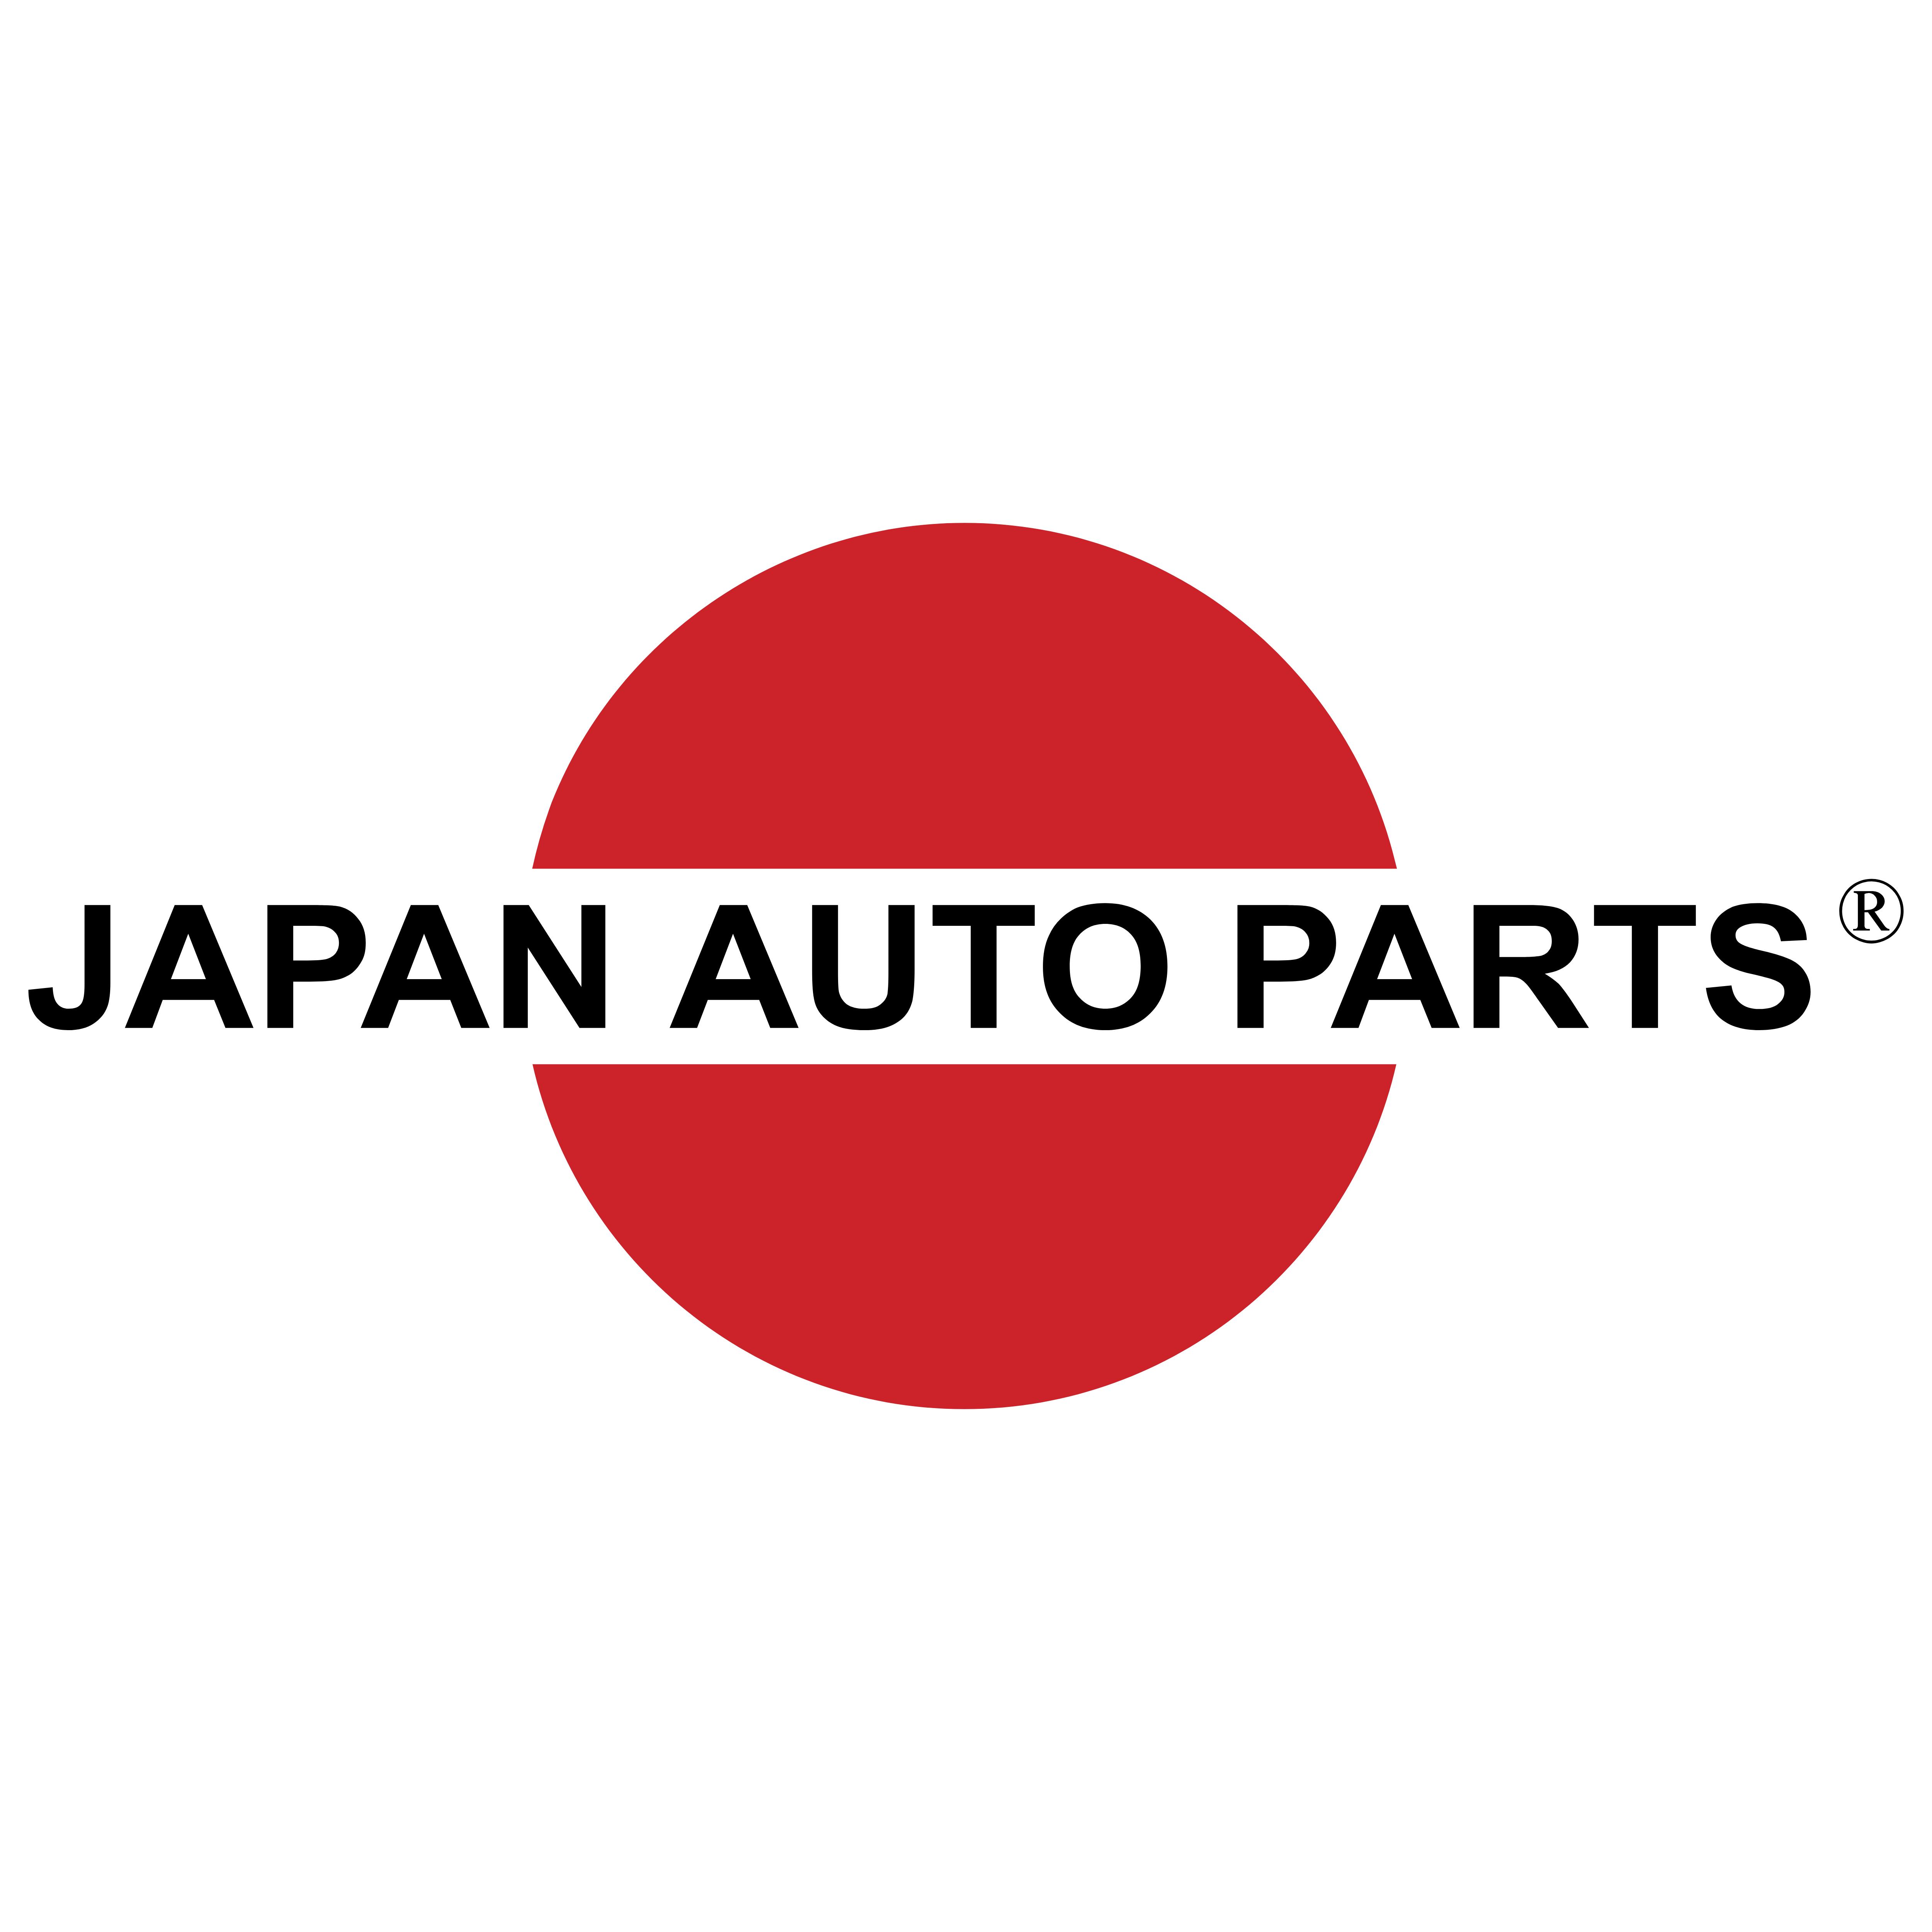 Japan Auto Parts - Logos Download